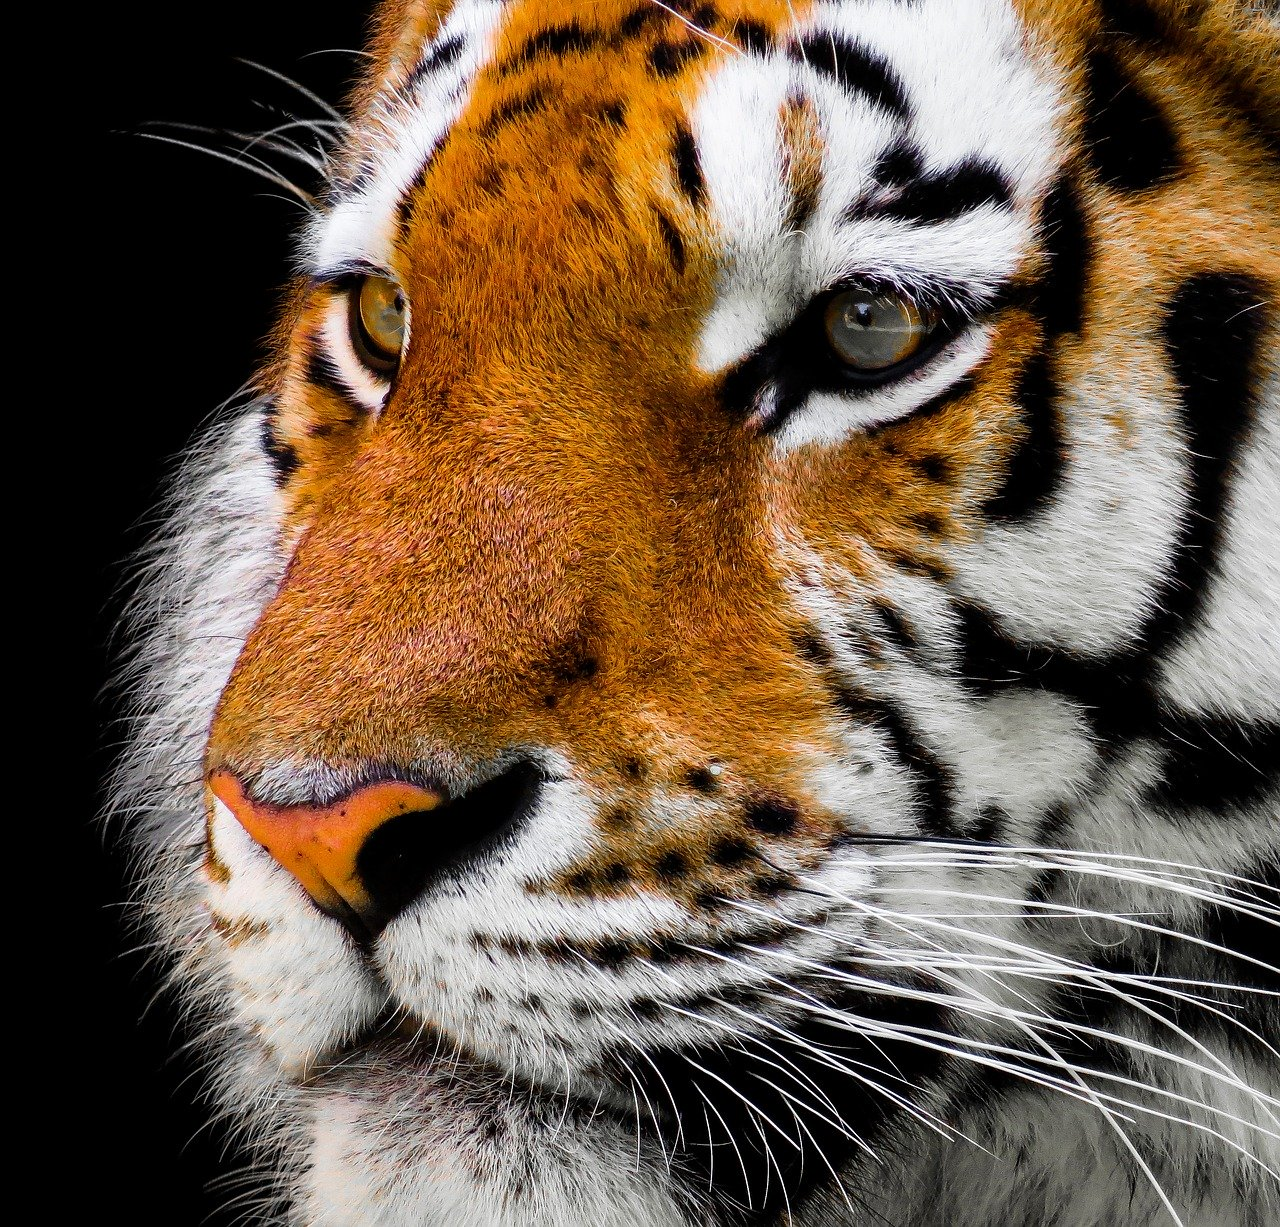 Pysk tygrysa